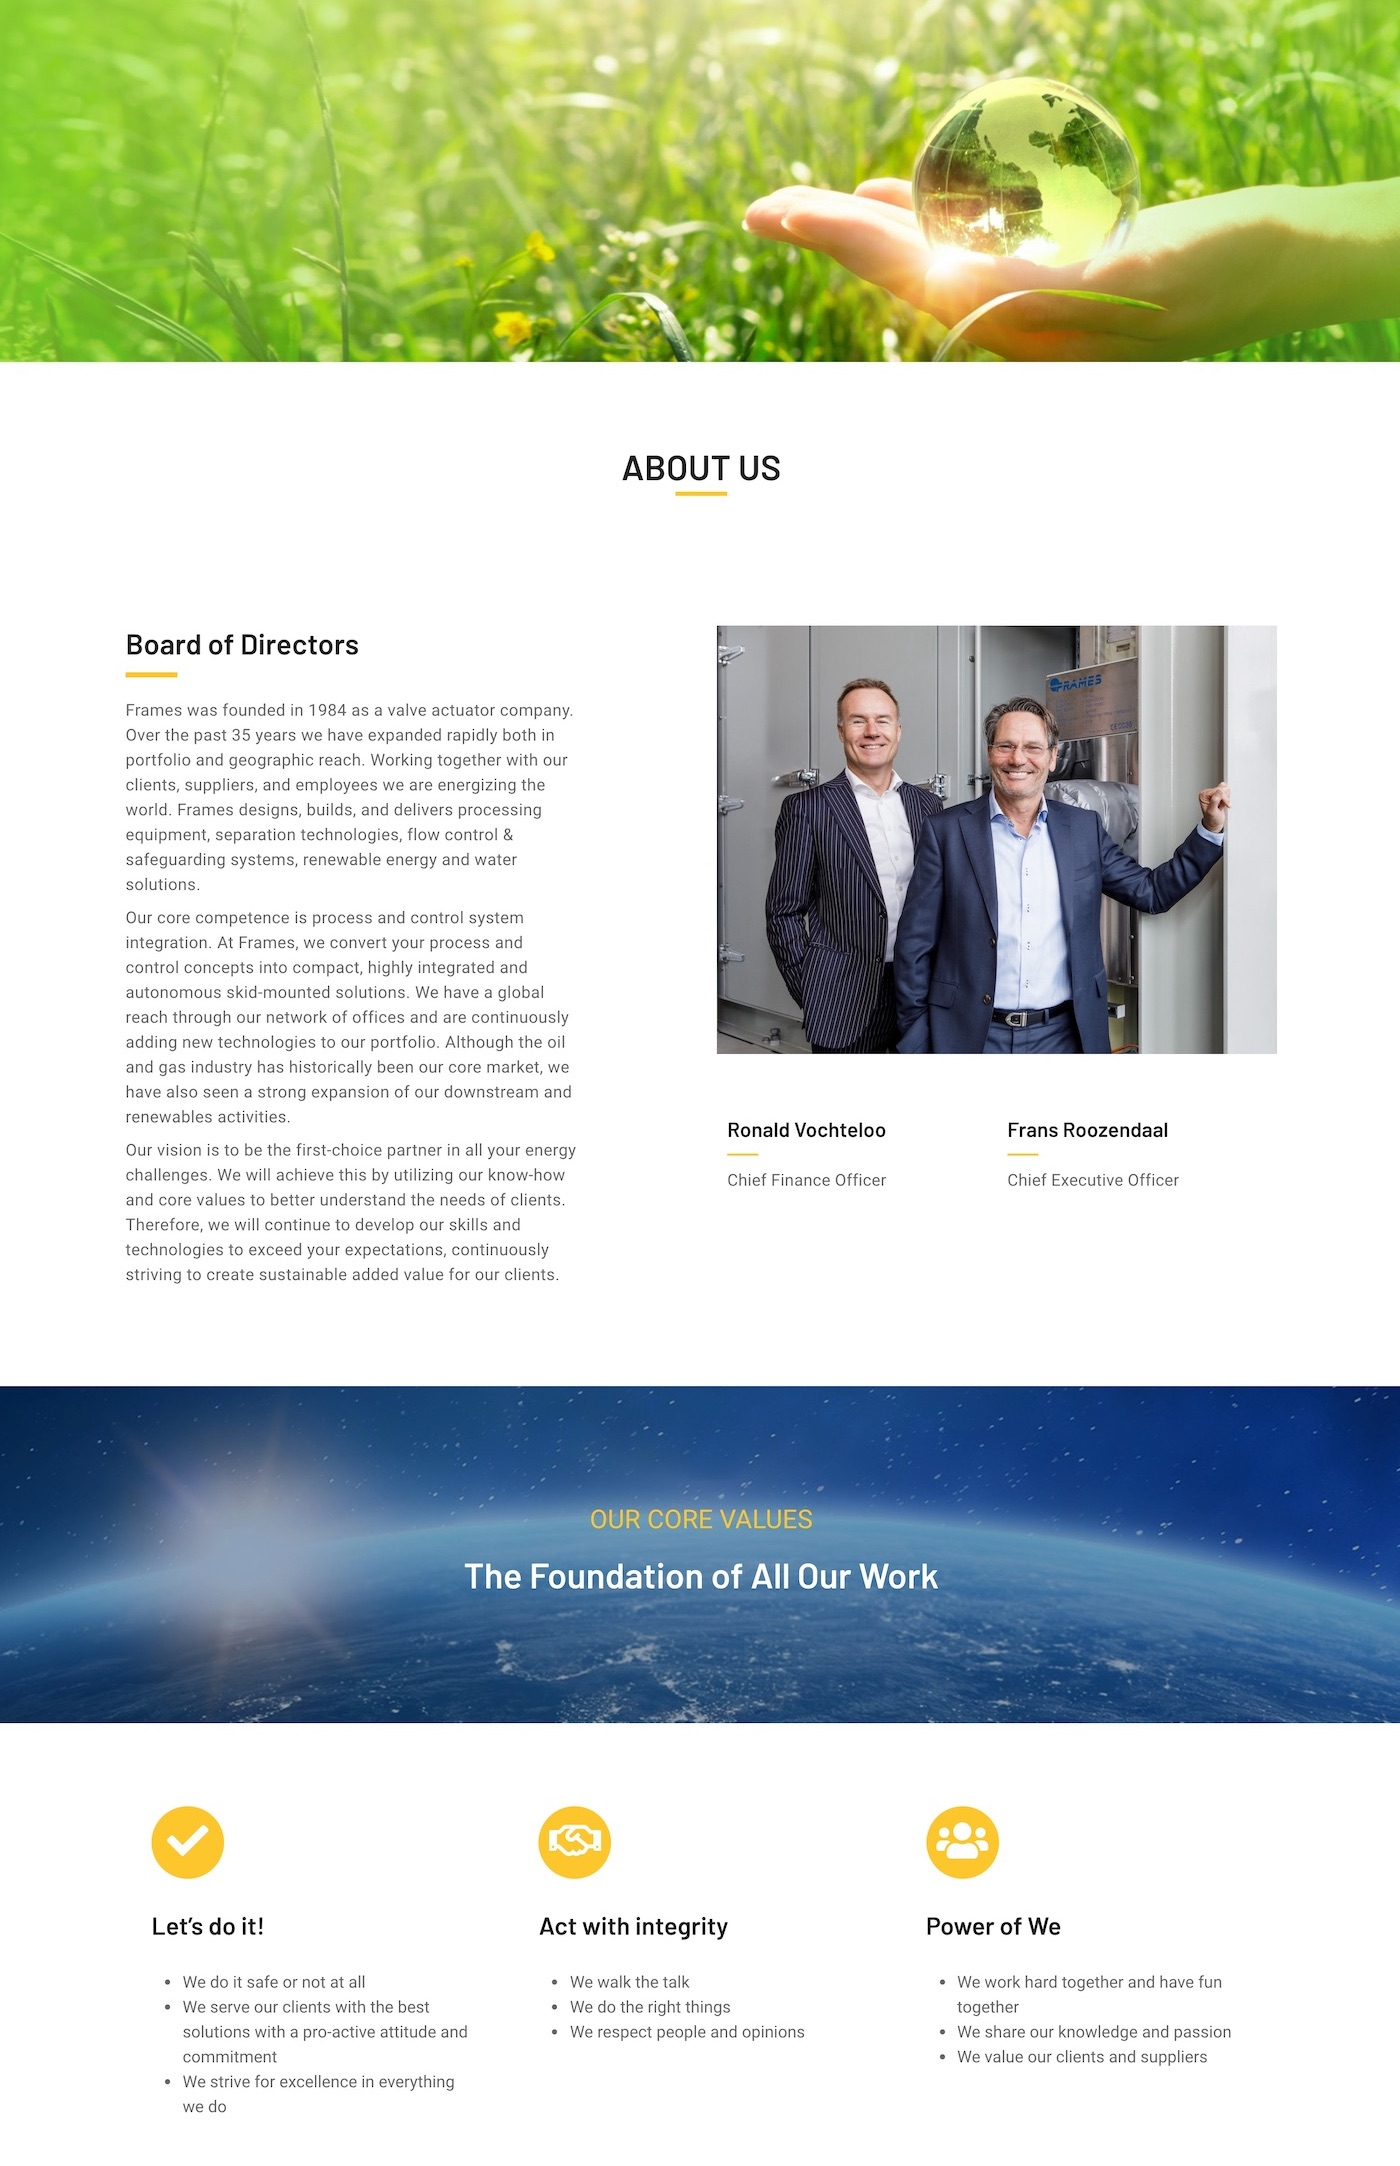 frames-group.com-corporate-wordpress-website-development-work-in-netherland-europe-about-1